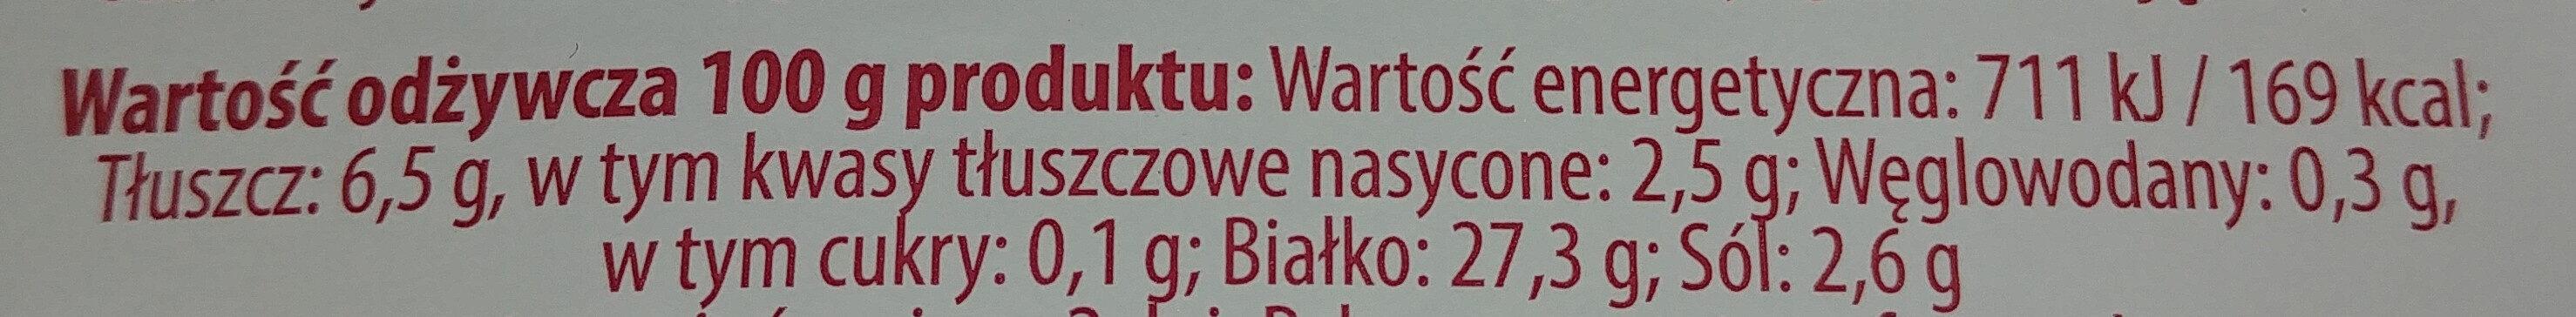 Kiełbasa krakowska sucha - Voedingswaarden - pl